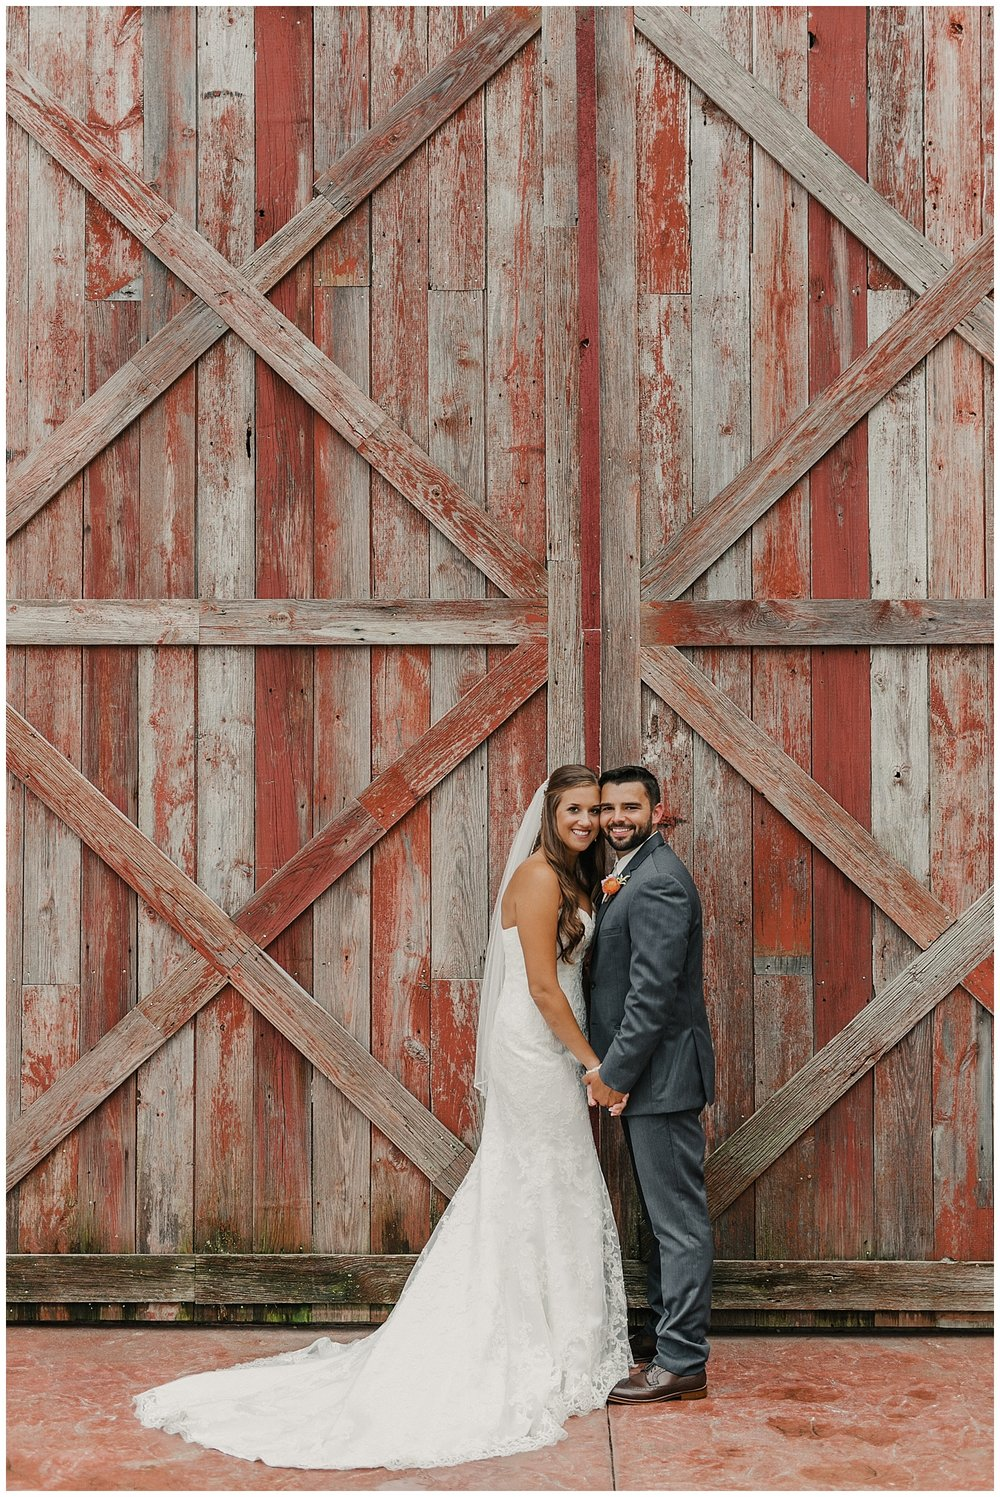 lindybeth photography - bravo wedding - blissful barn - blog-72.jpg